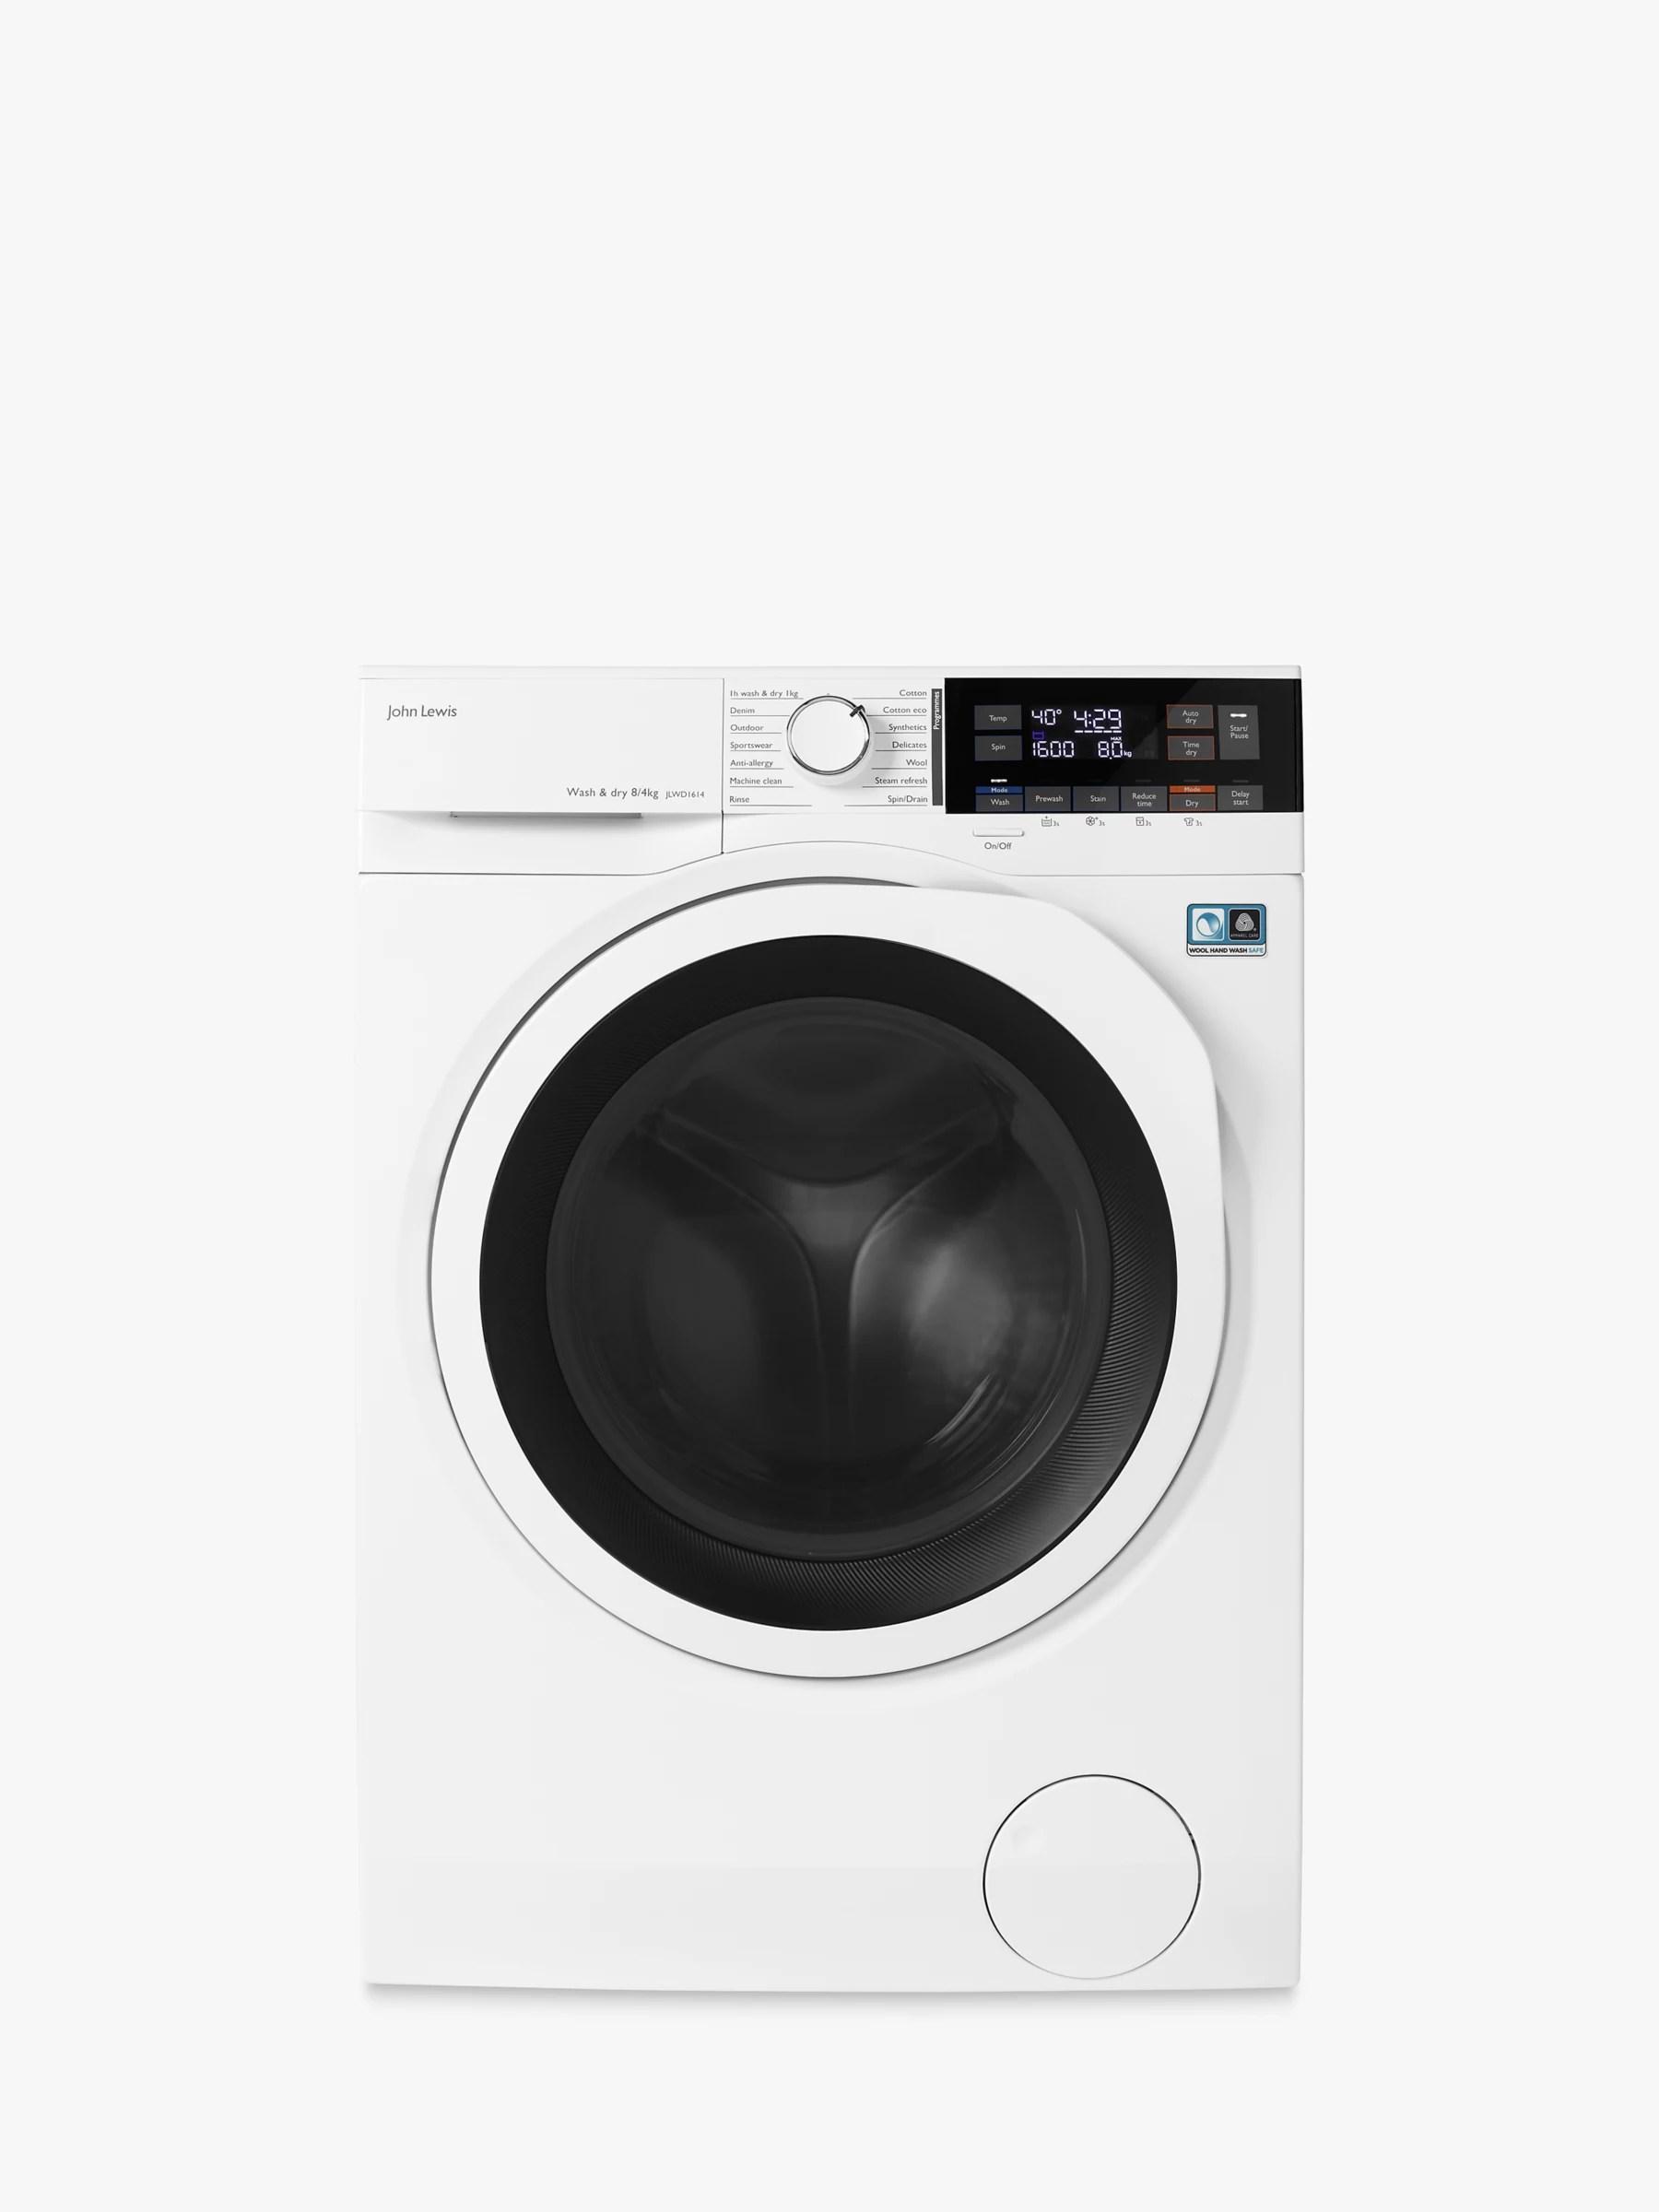 hight resolution of buy john lewis partners jlwd1614 freestanding washer dryer 8kg wash 4kg dry load